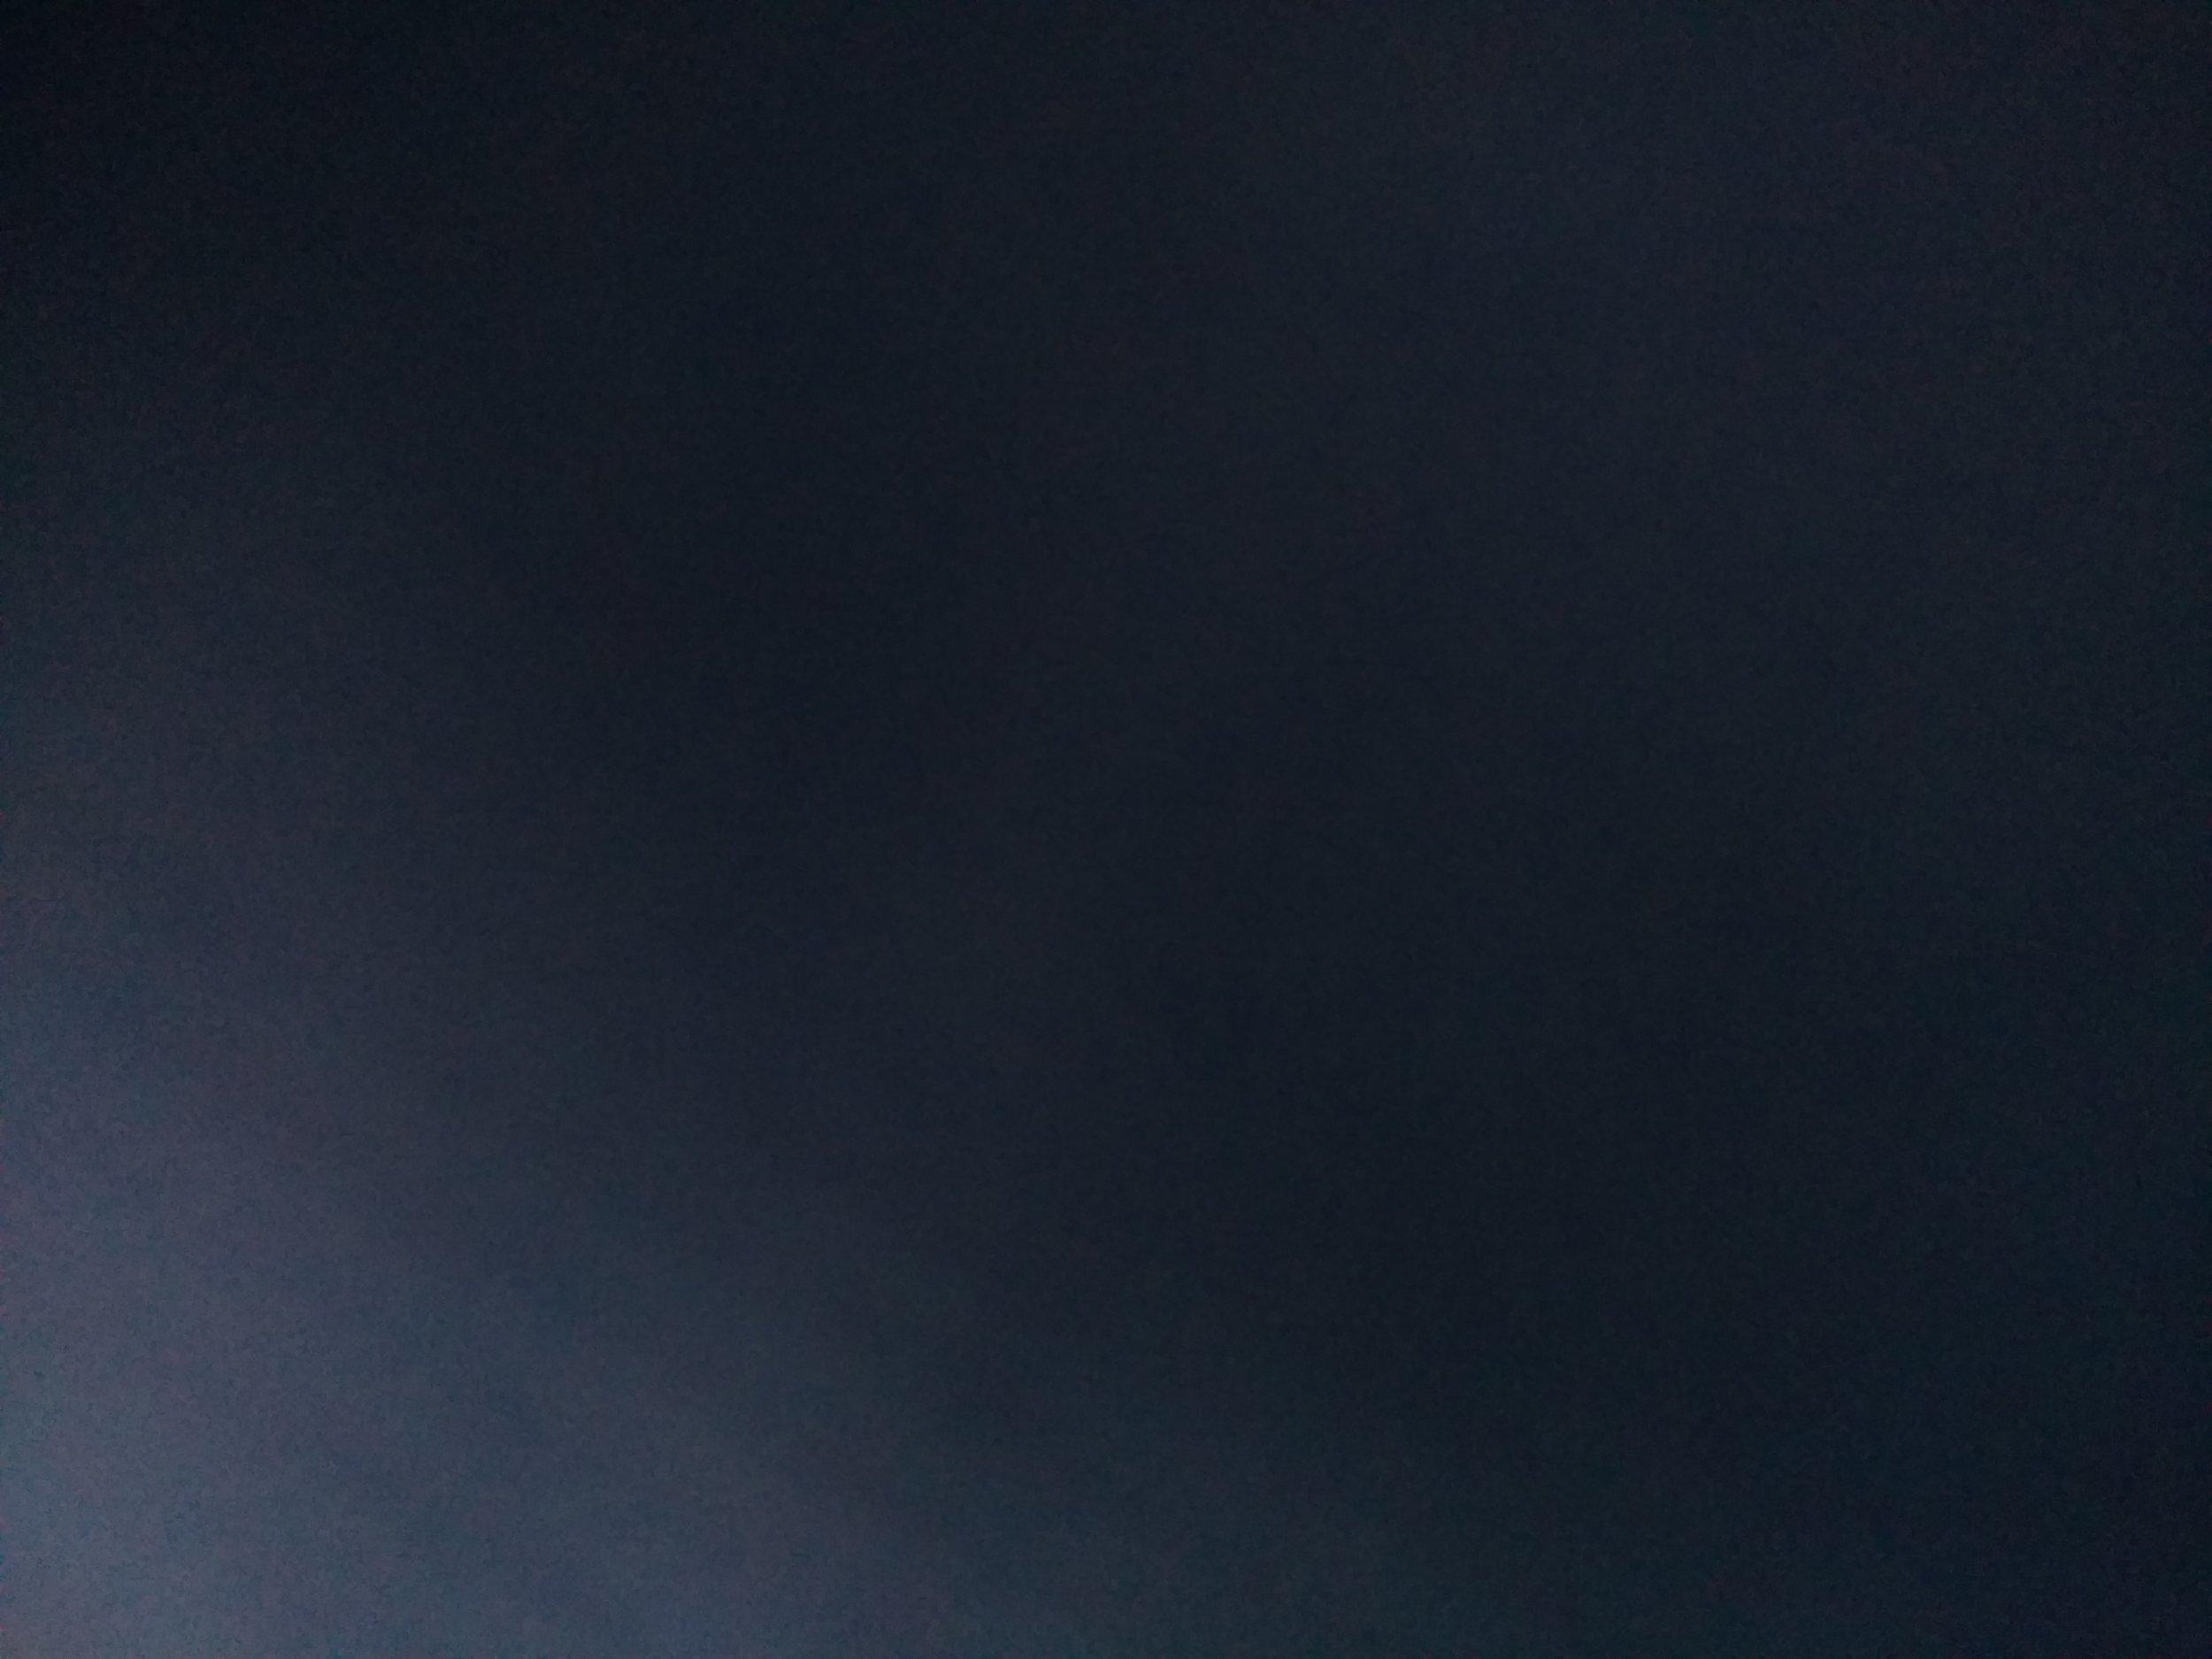 willroth-co-free-texture-gradient-085.jpg